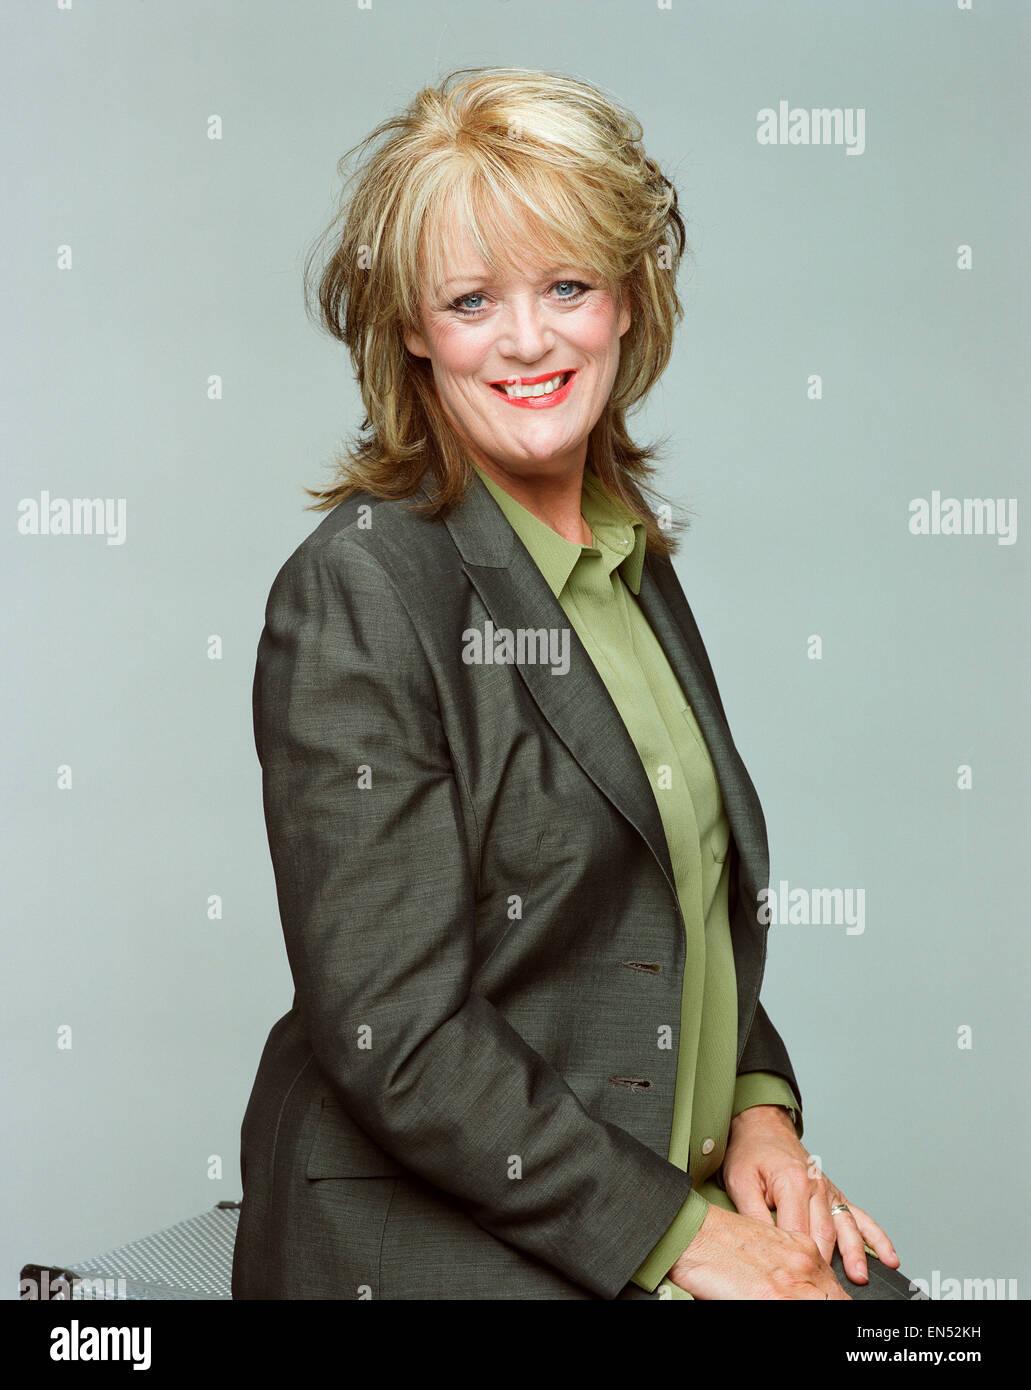 Sherrie Hewson Schauspielerin posiert in den Menschen-Studios. 24. Juni 1999. Stockbild